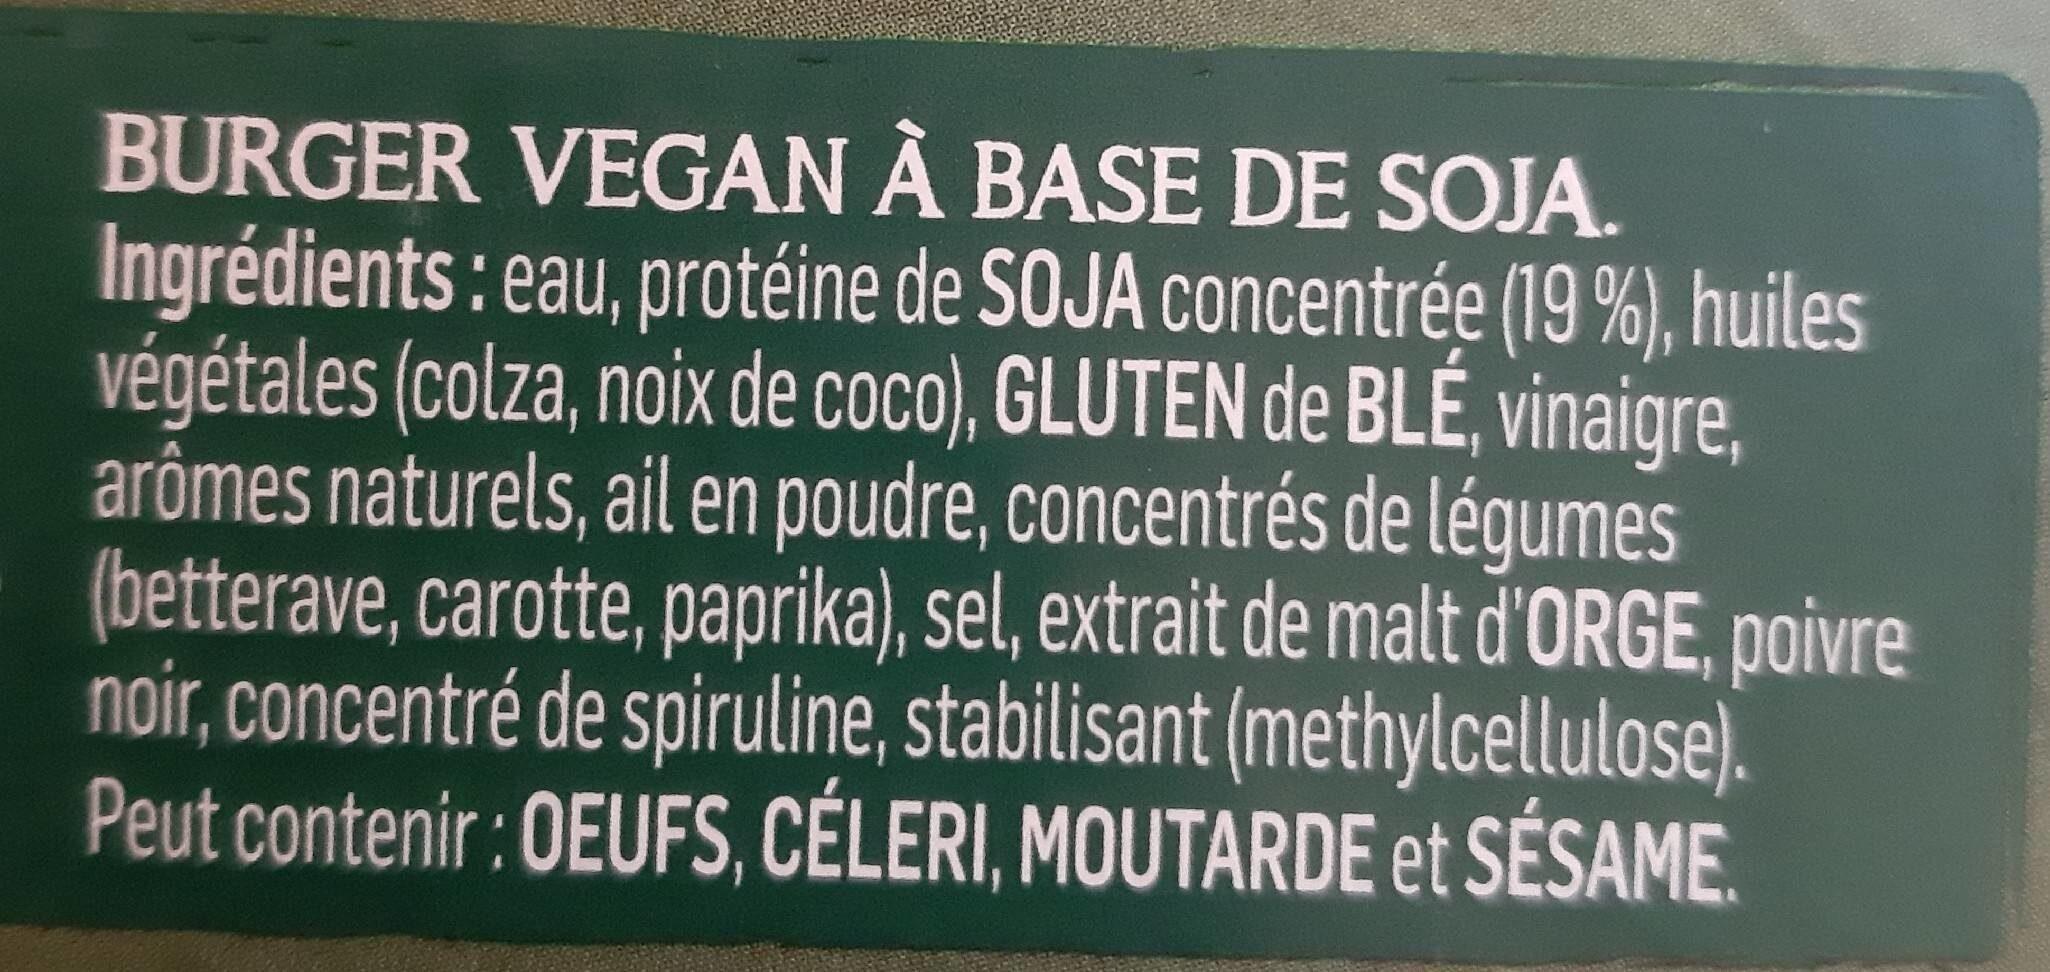 Incredible burger - Ingredients